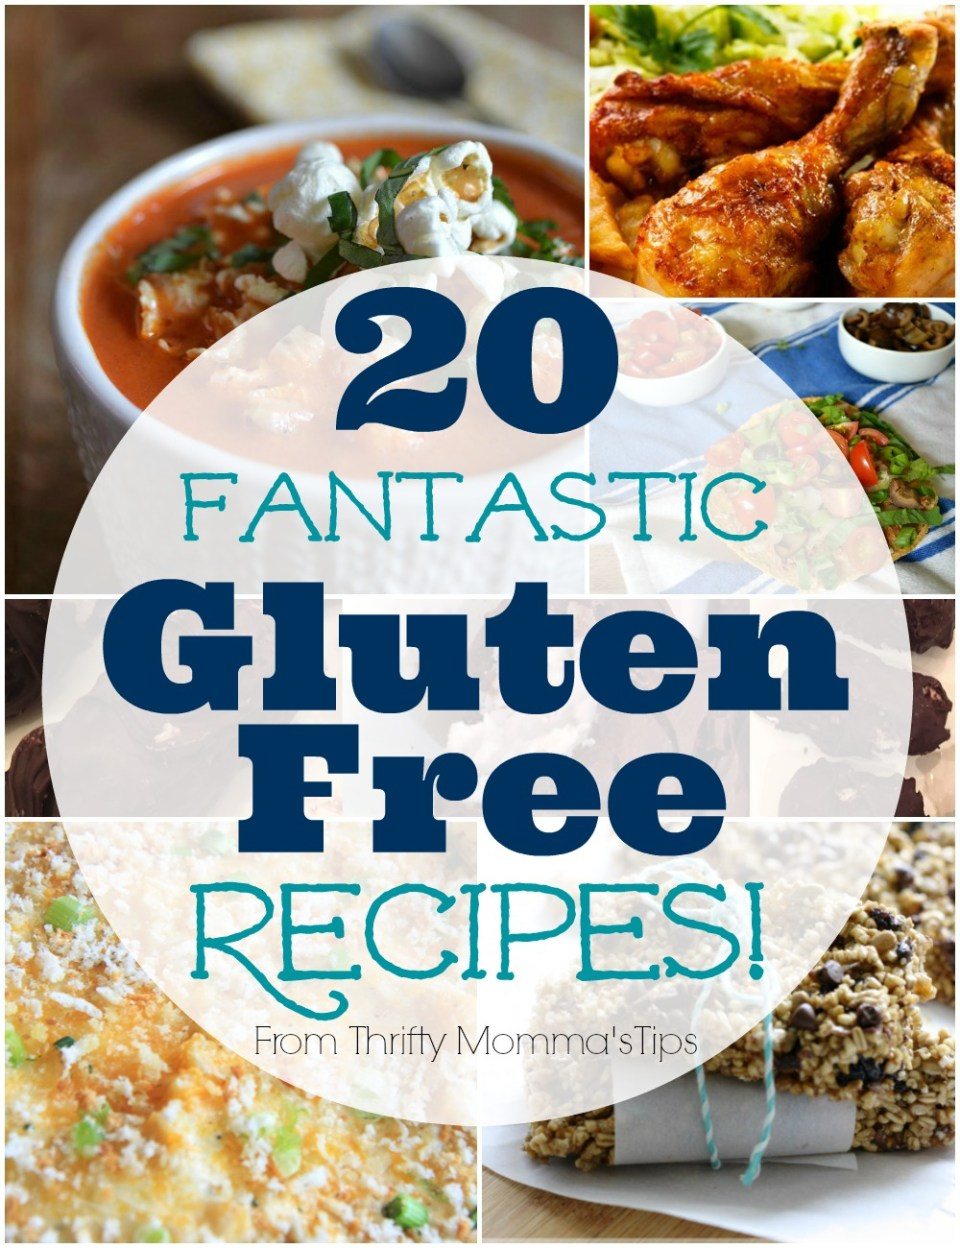 Fantastic Gluten Free Recipes